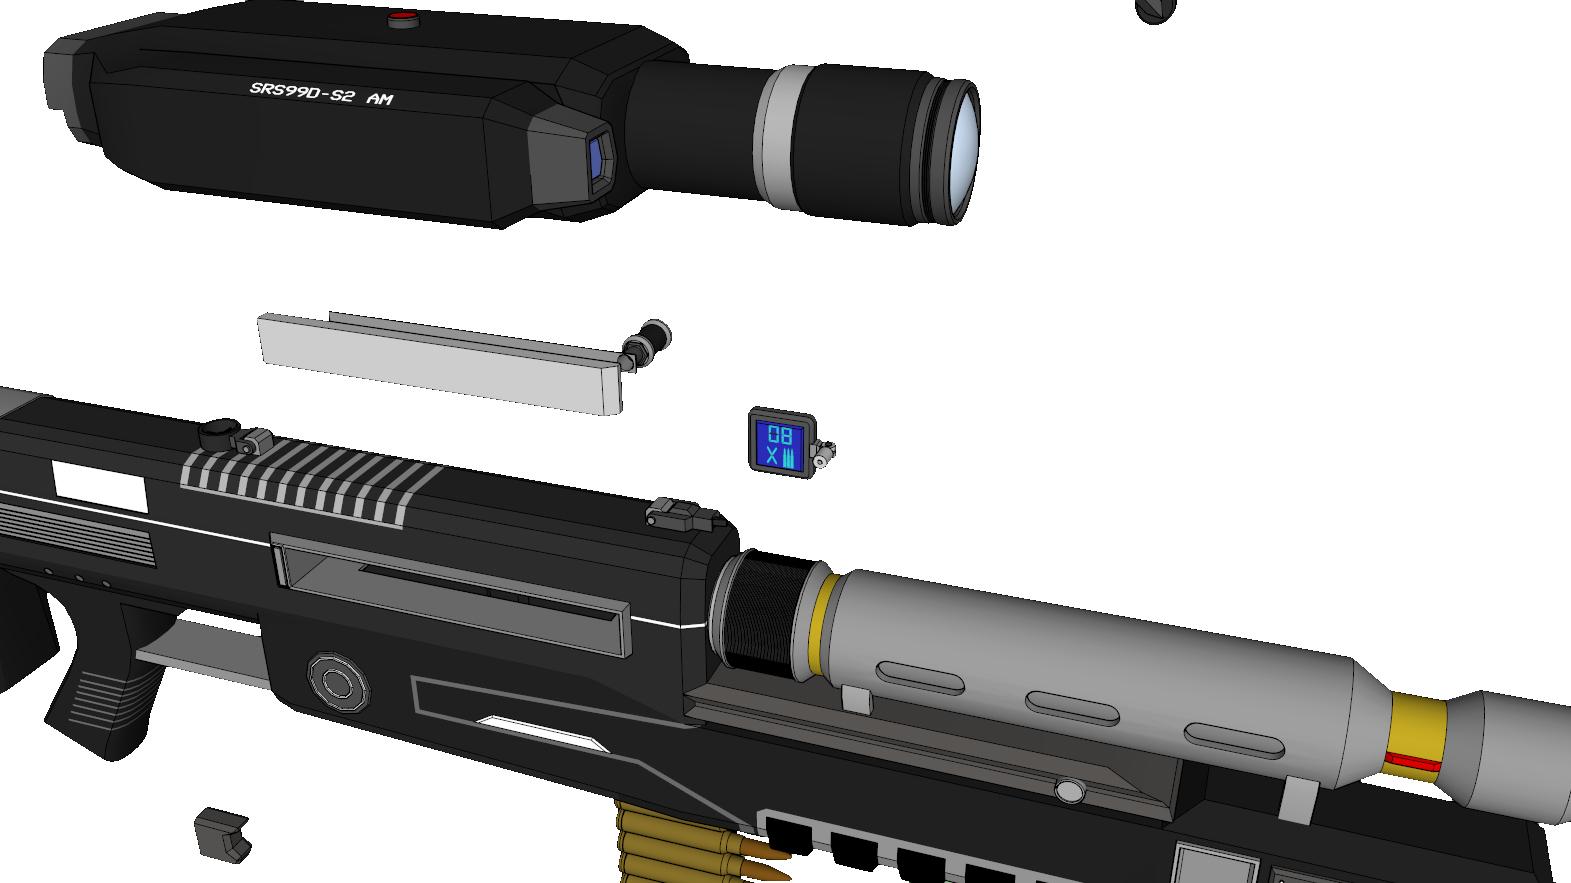 SRS 99 D Sniper Rifle - Halo @ Pinshape